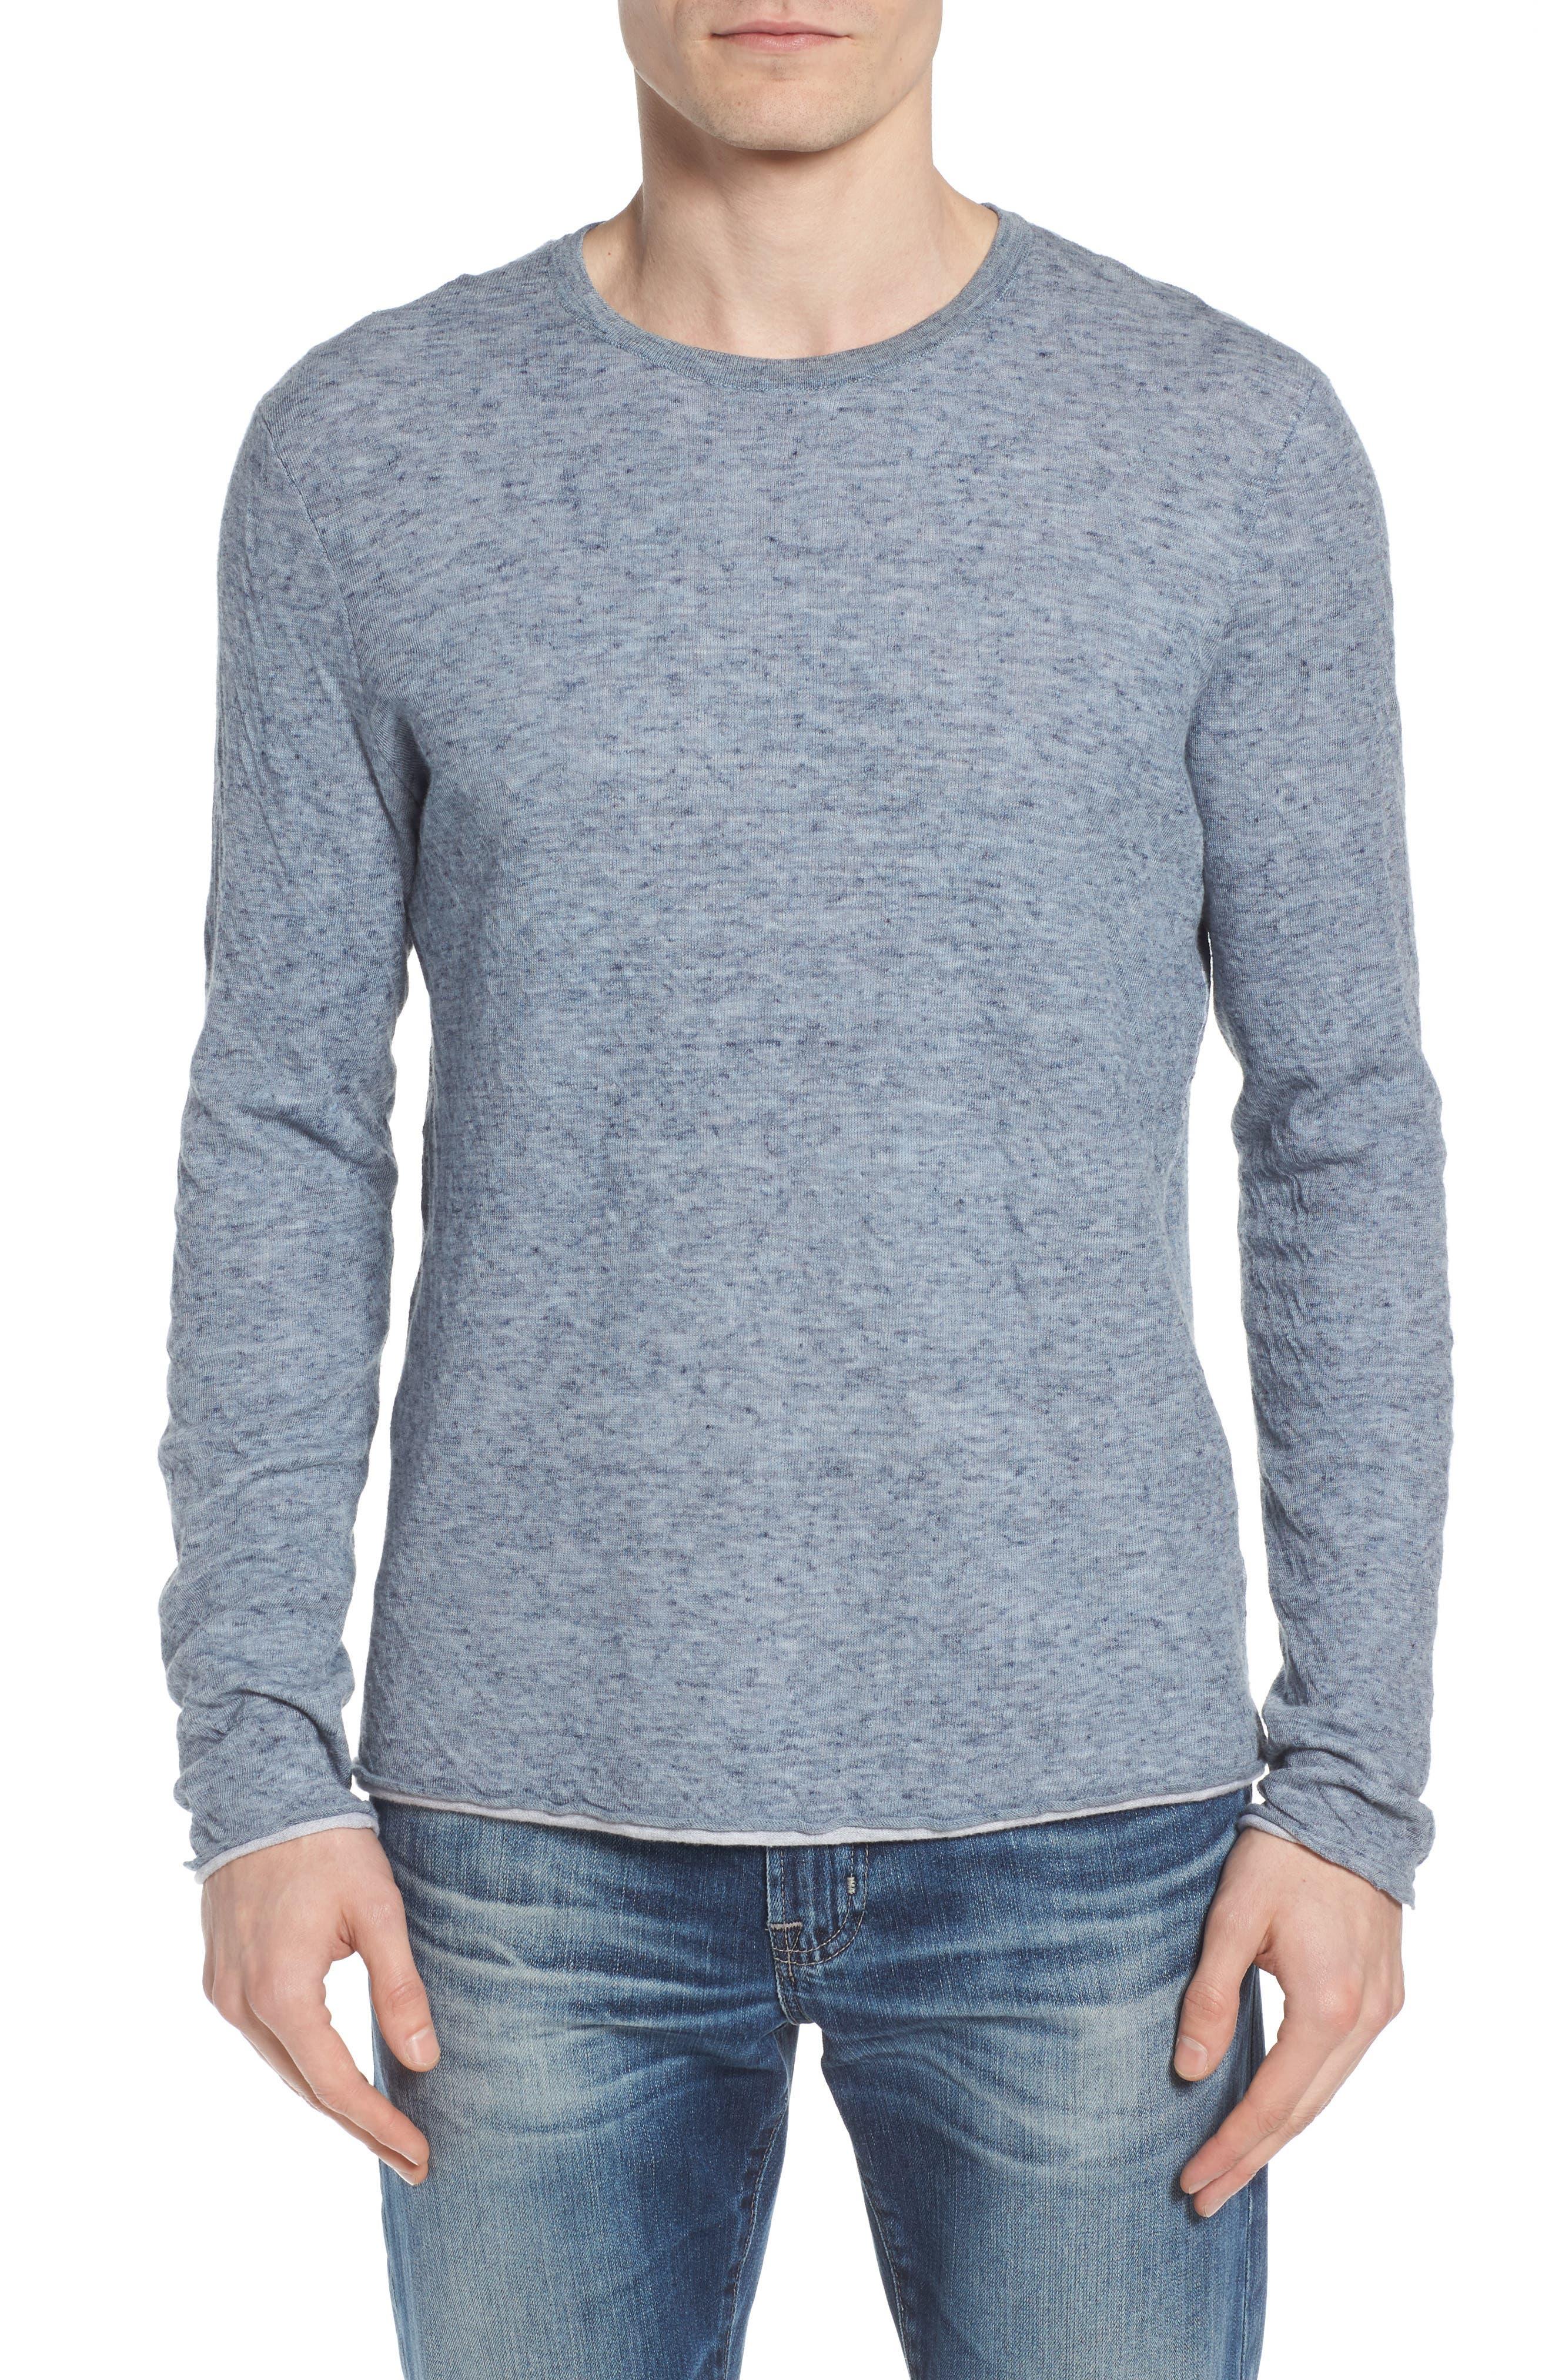 Tripp Regular Fit Crewneck Shirt,                         Main,                         color, Light Blue